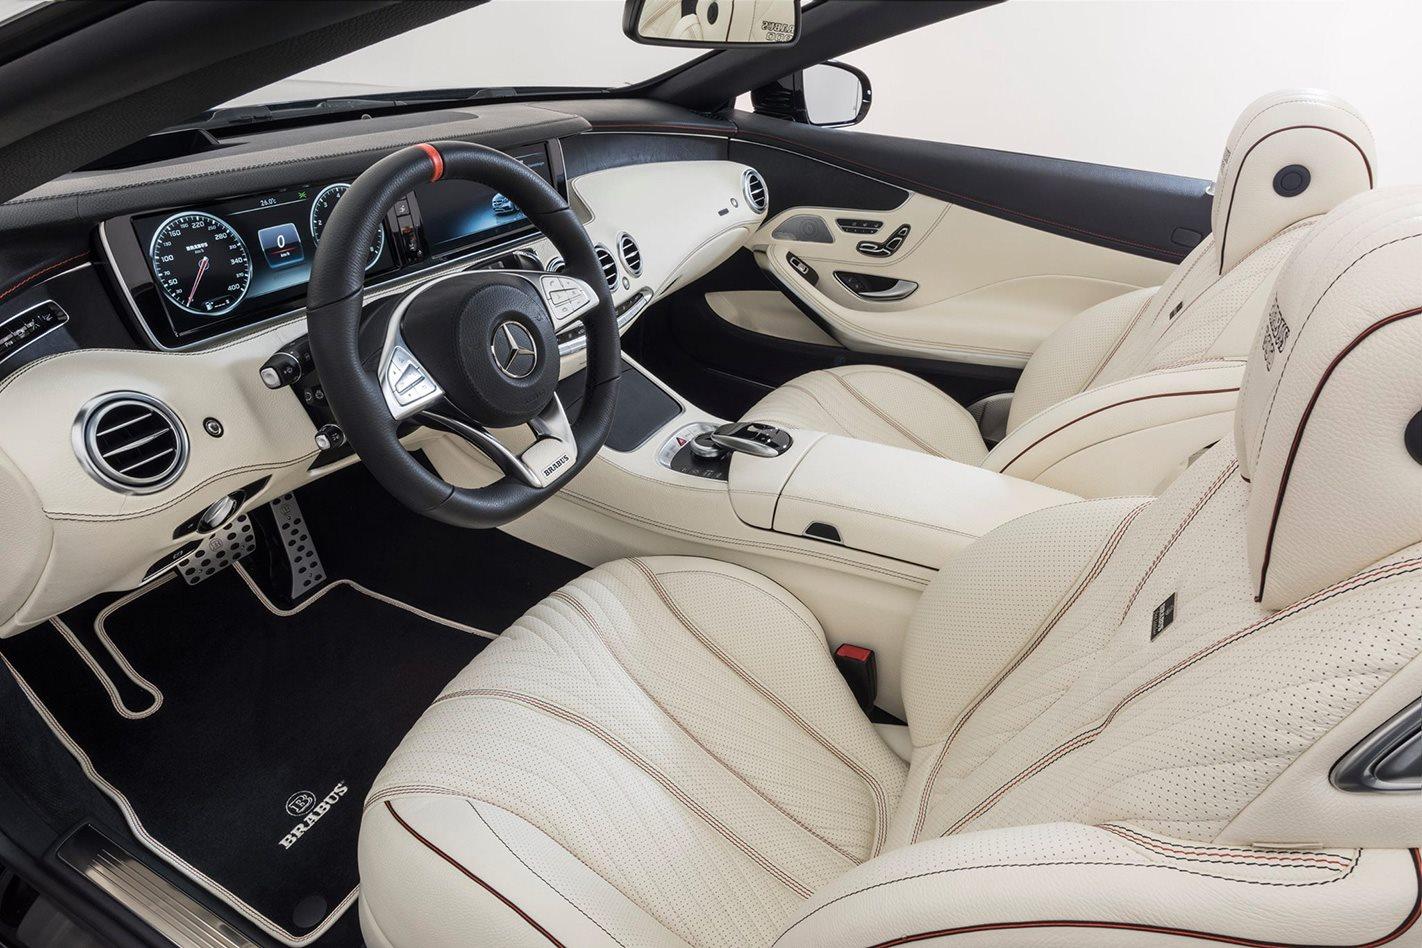 Mercedes-AMG S 65-based Brabus Rocket 900 interior